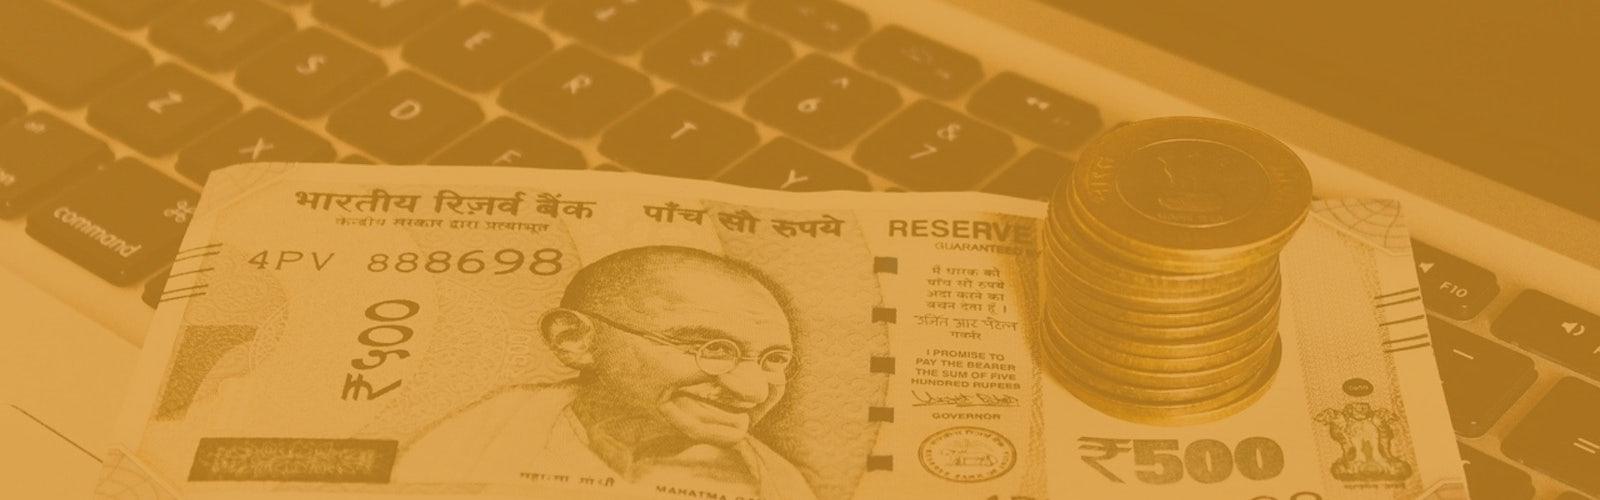 Best Online Casino Reload Bonuses in India